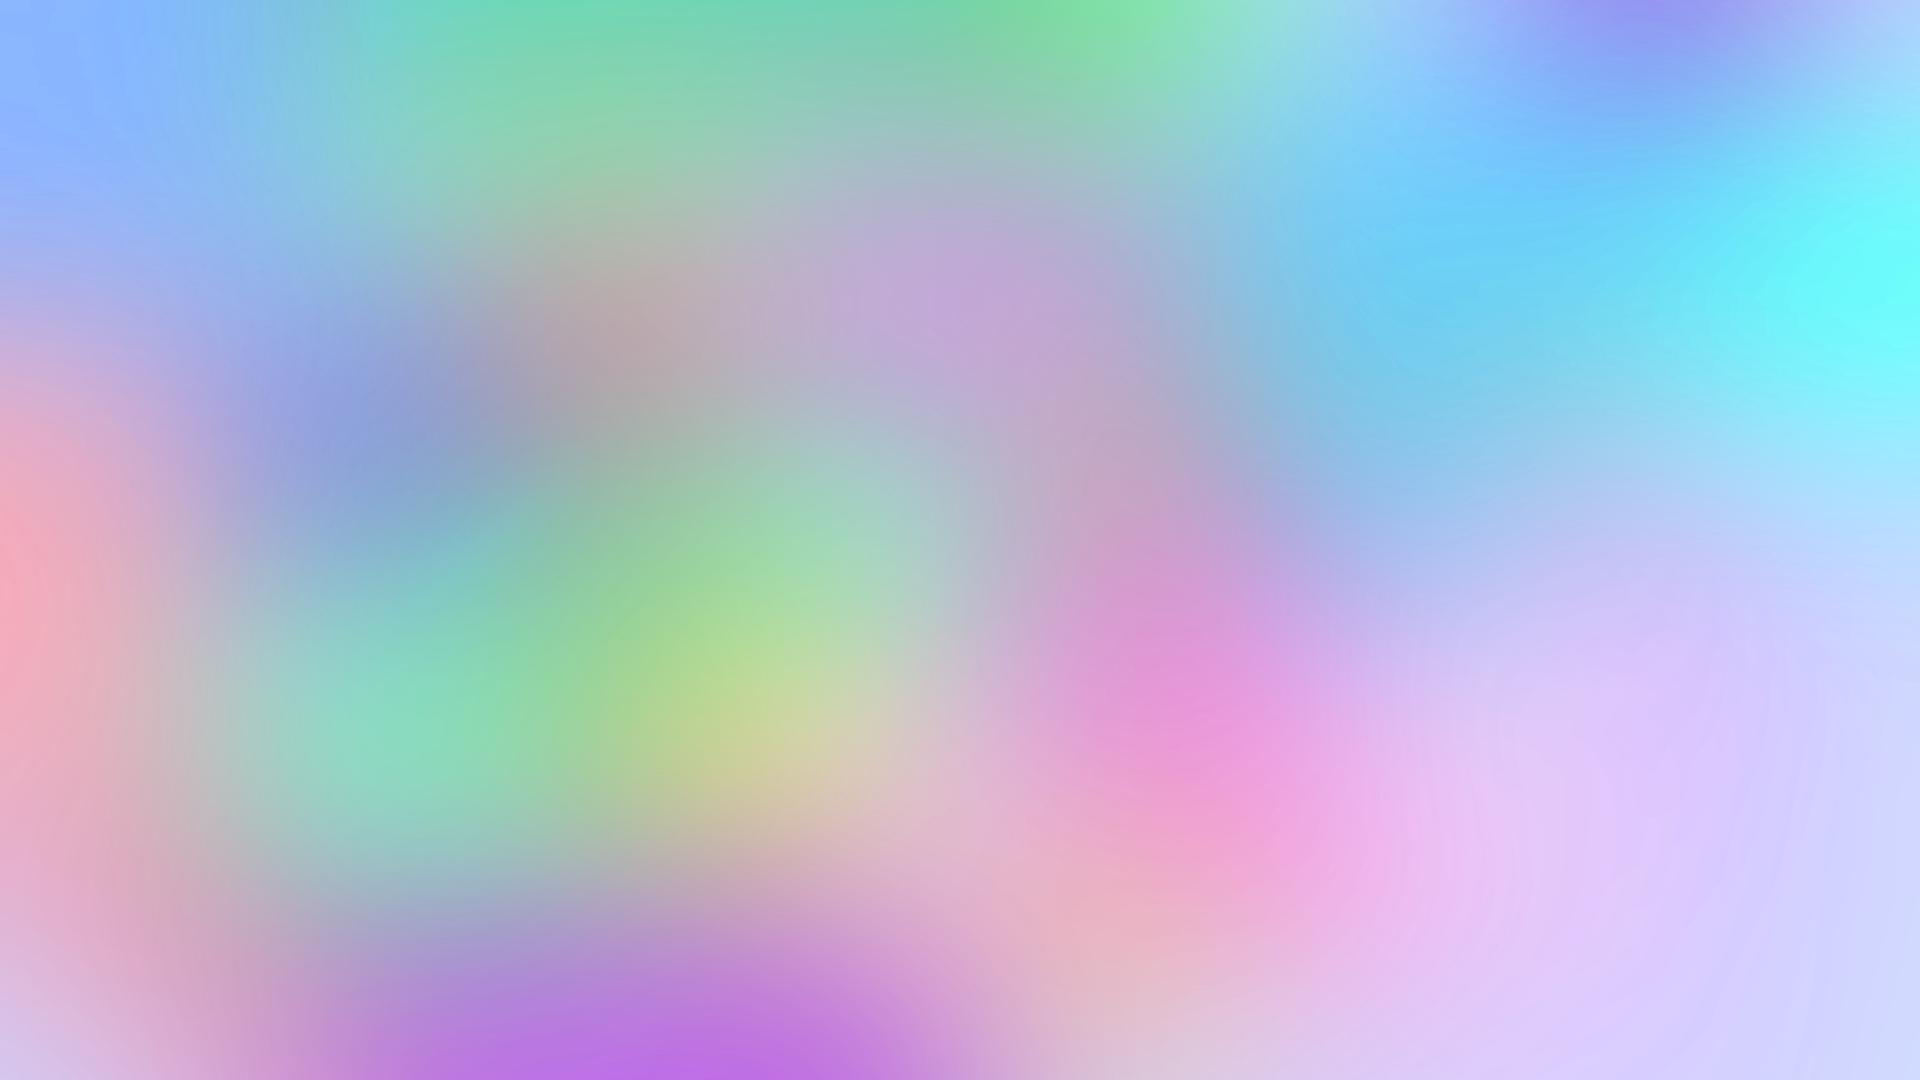 Pastel wallpaper   155180 1920x1080